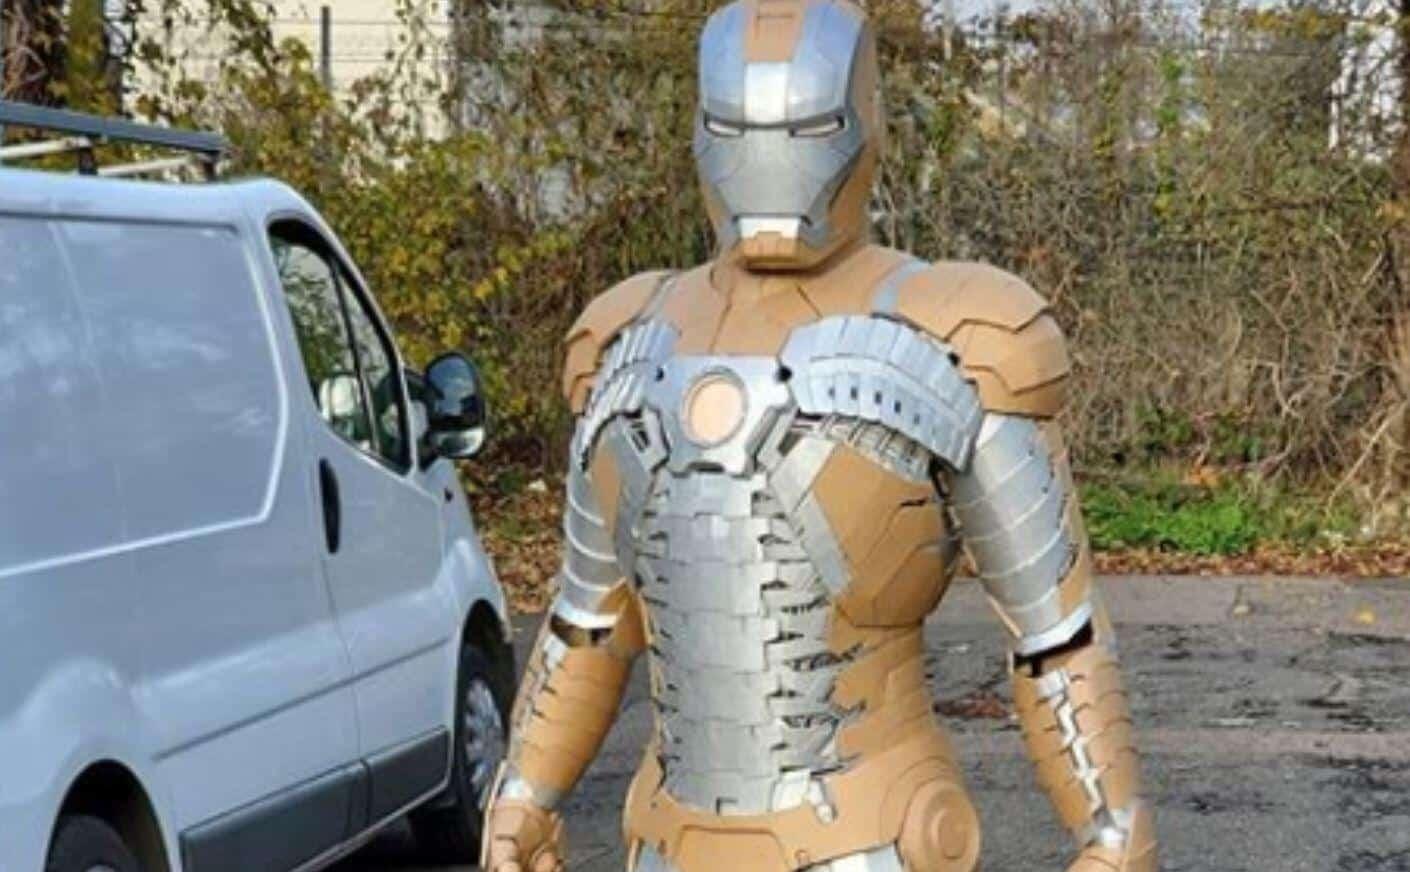 Iron Man Cardboard Suit